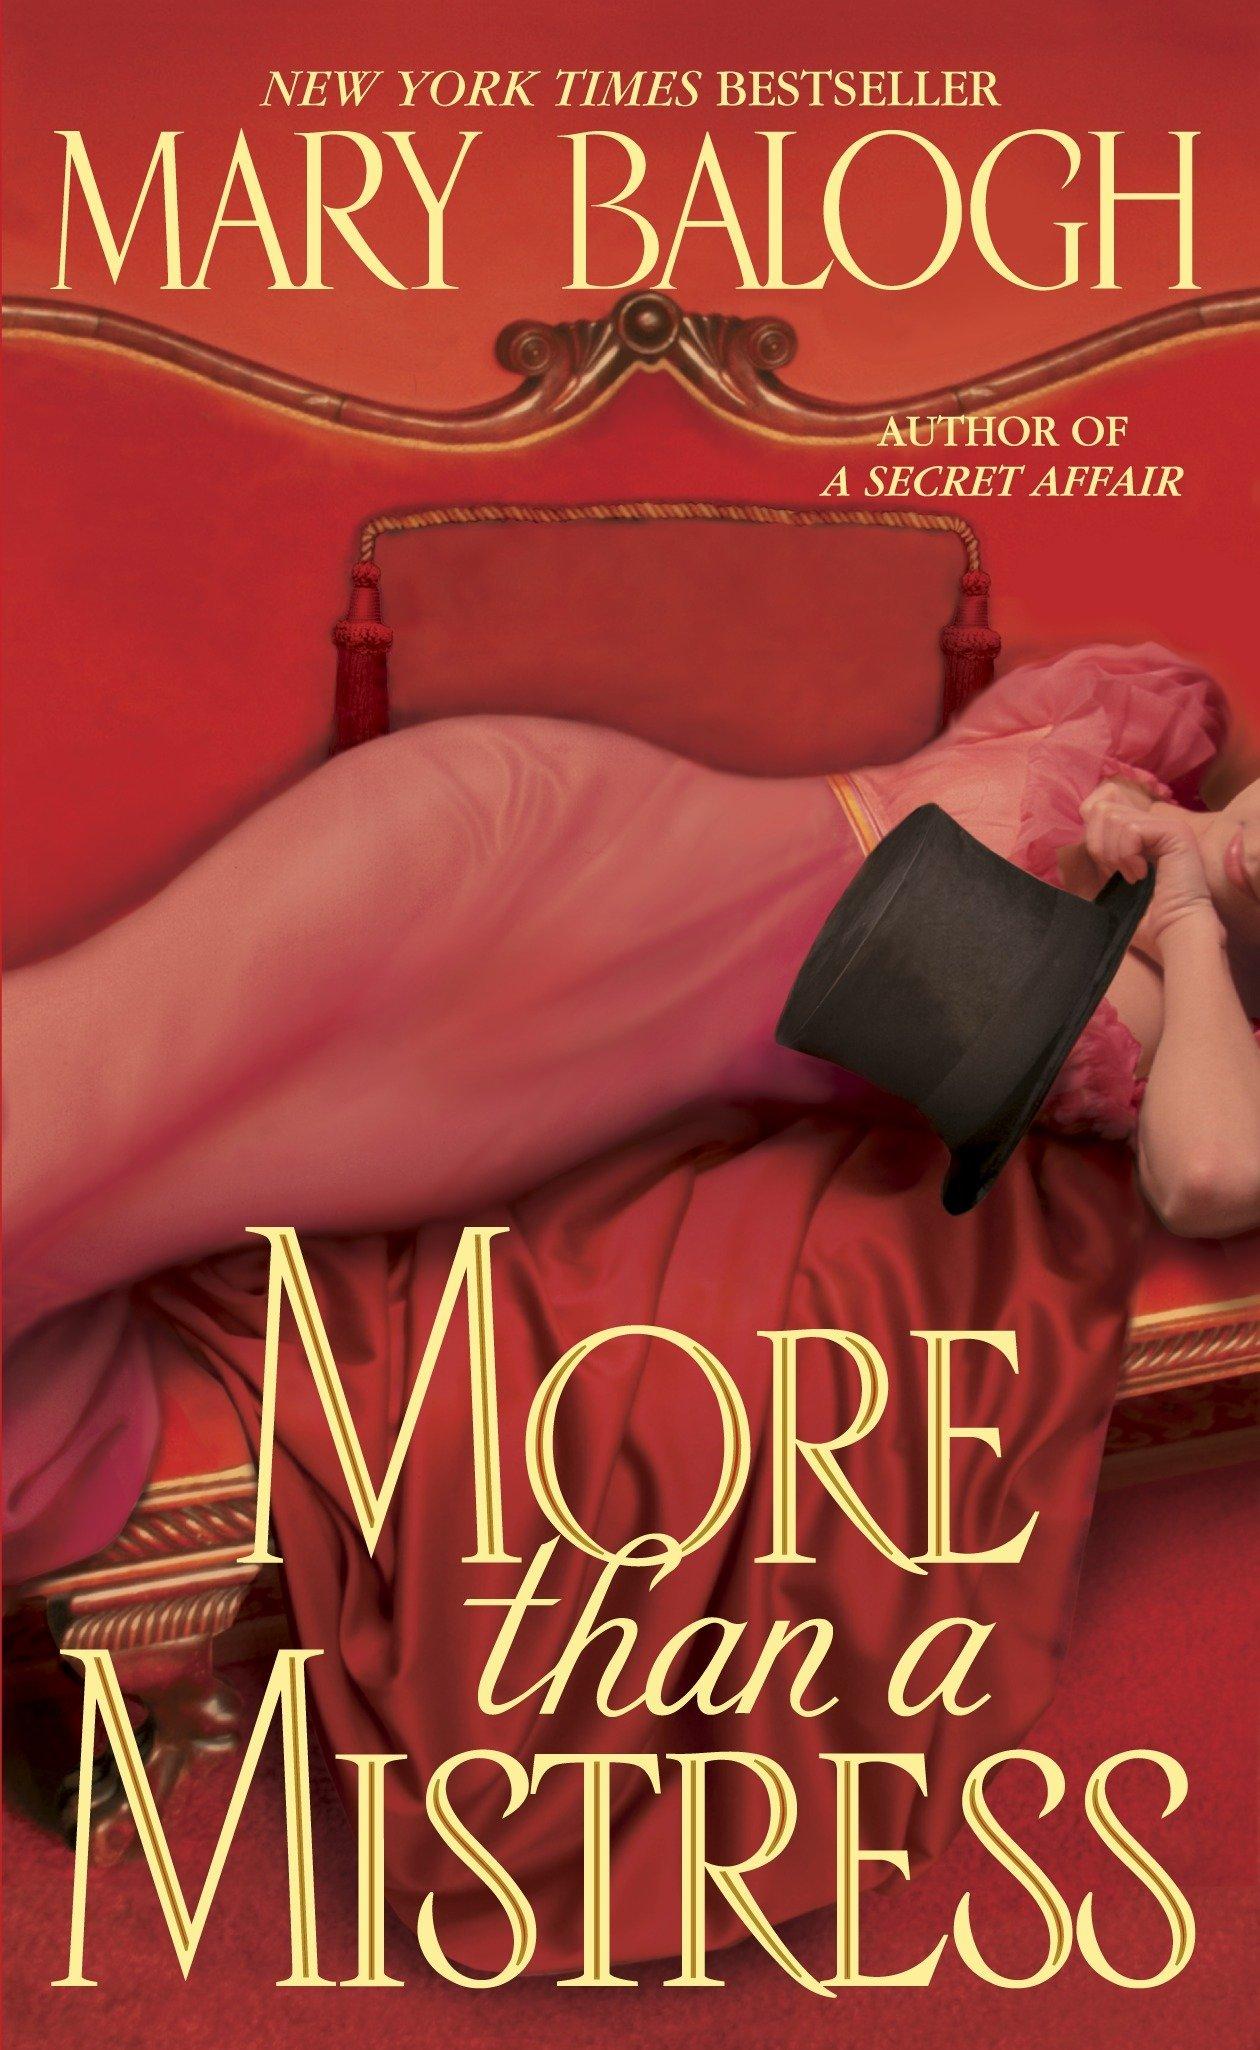 Read Online More than a Mistress (The Mistress Trilogy) pdf